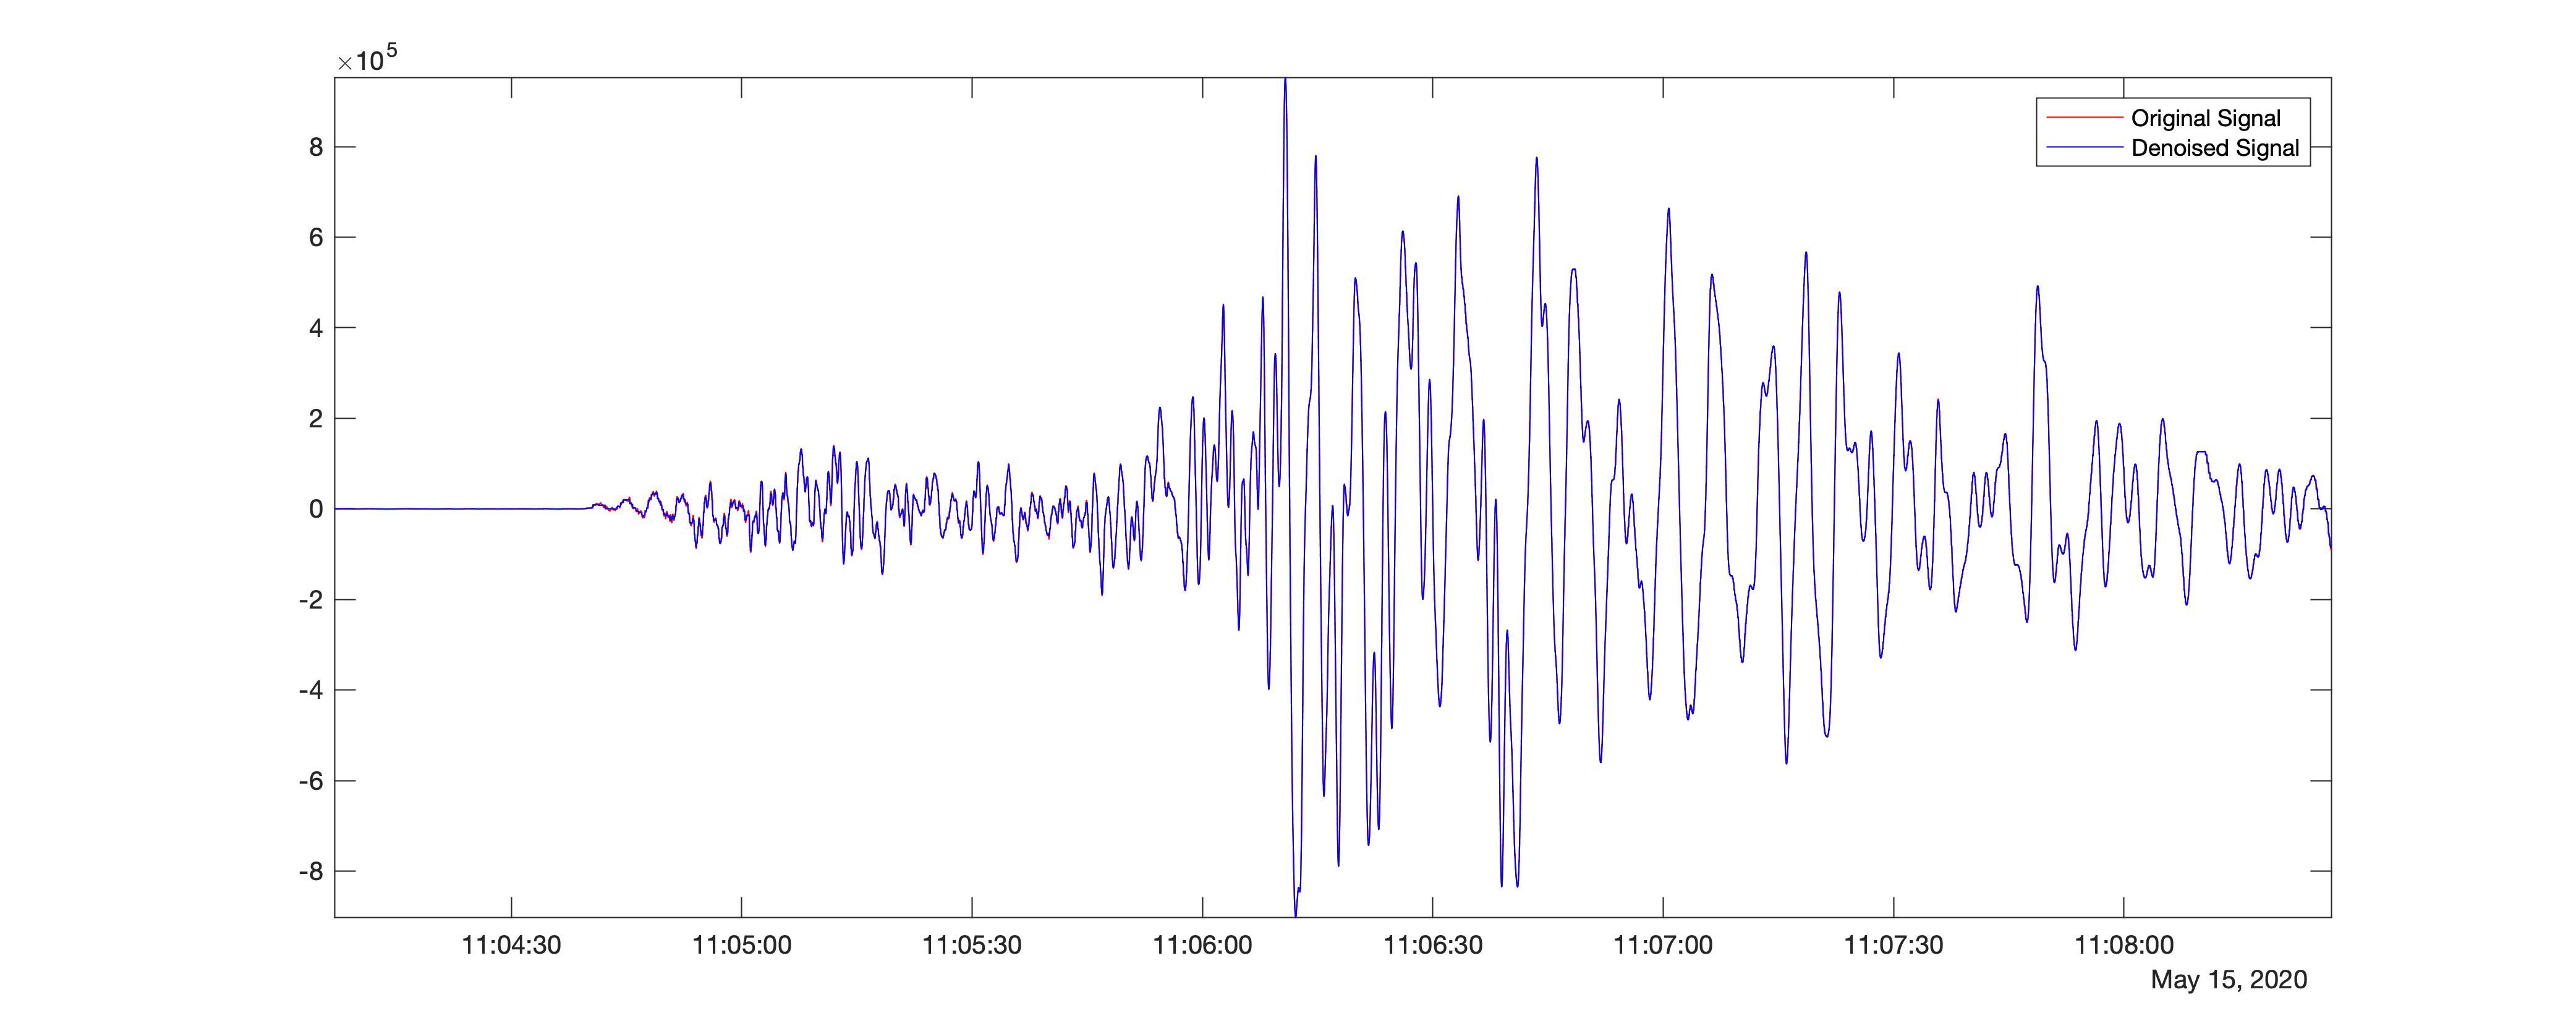 Denoised seismic time-series using db1